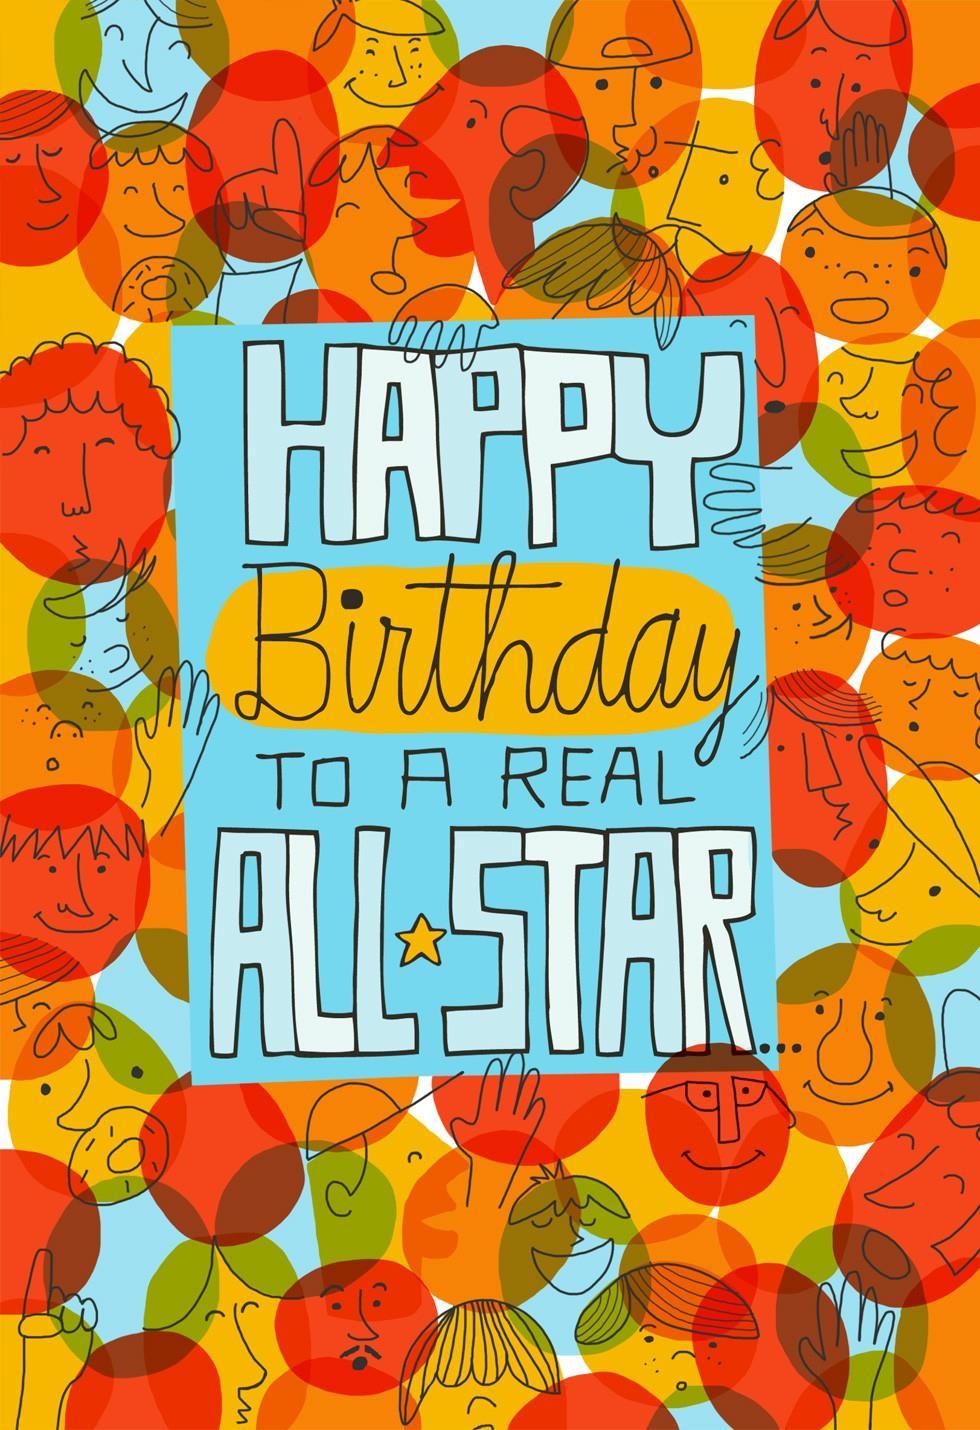 All Star Pop Up Musical Birthday Card Greeting Cards Hallmark